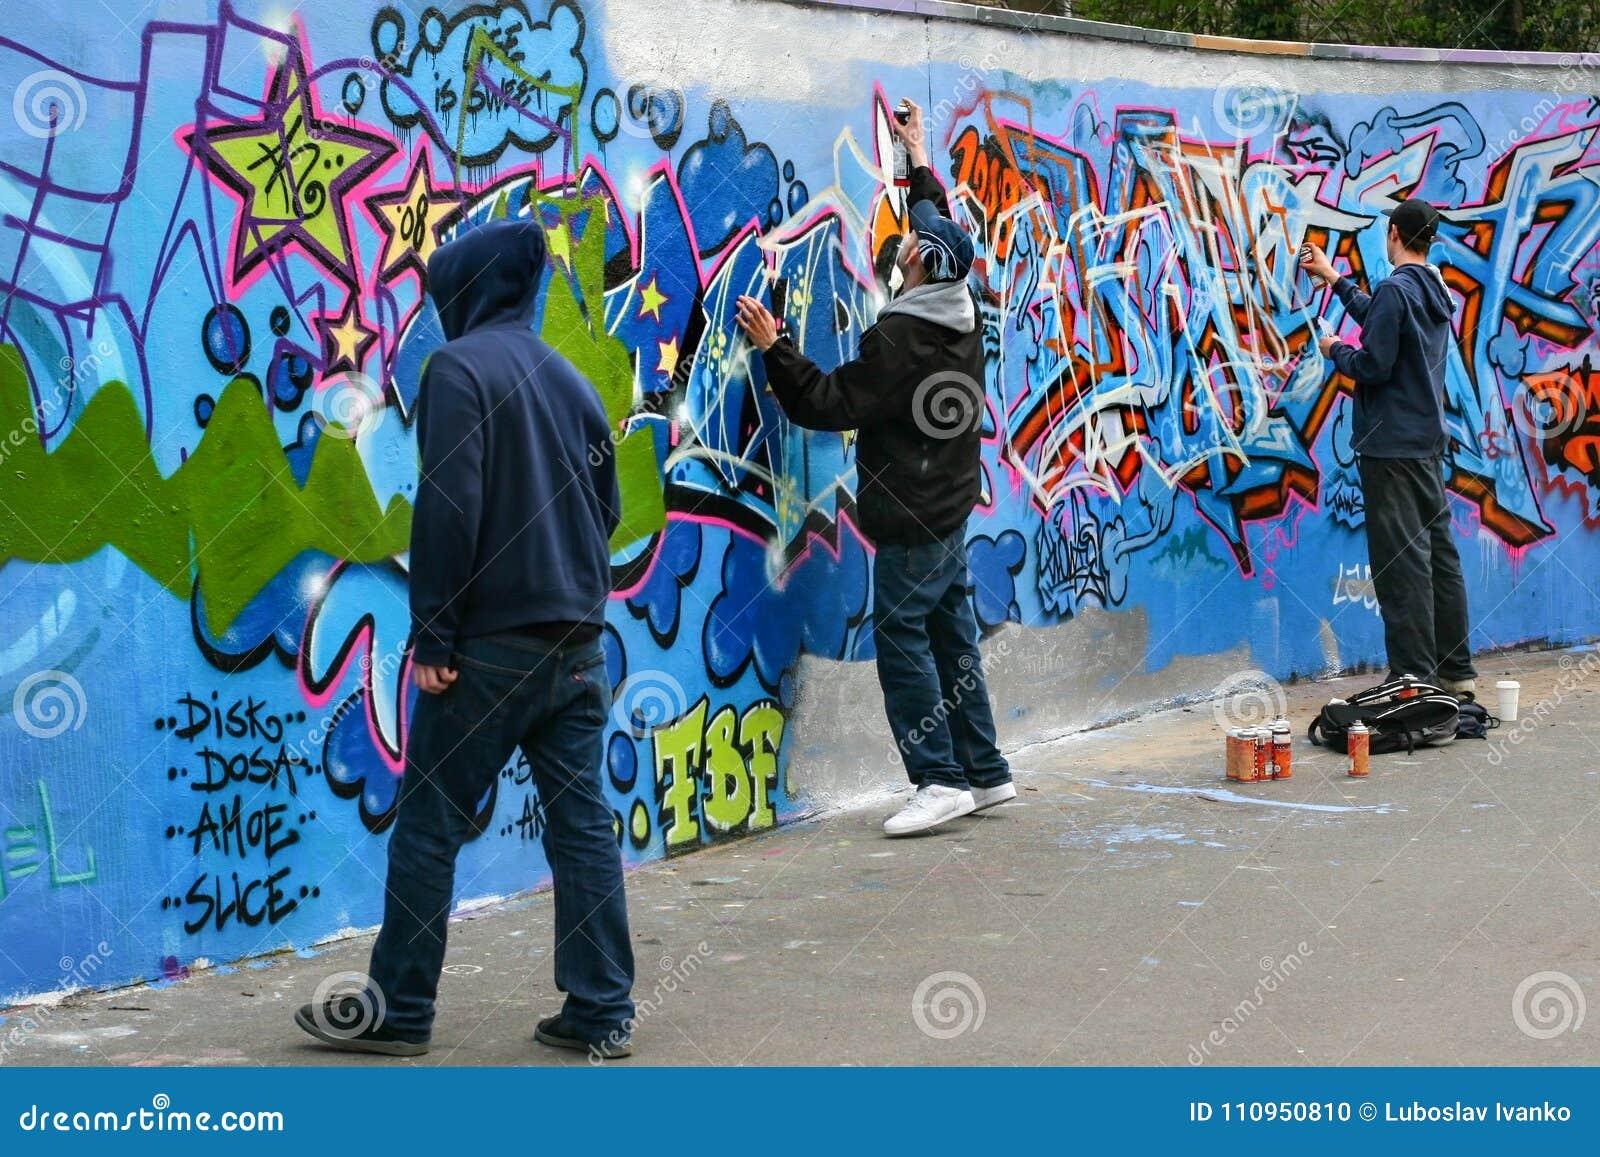 Drie jongens die graffiti schilderen